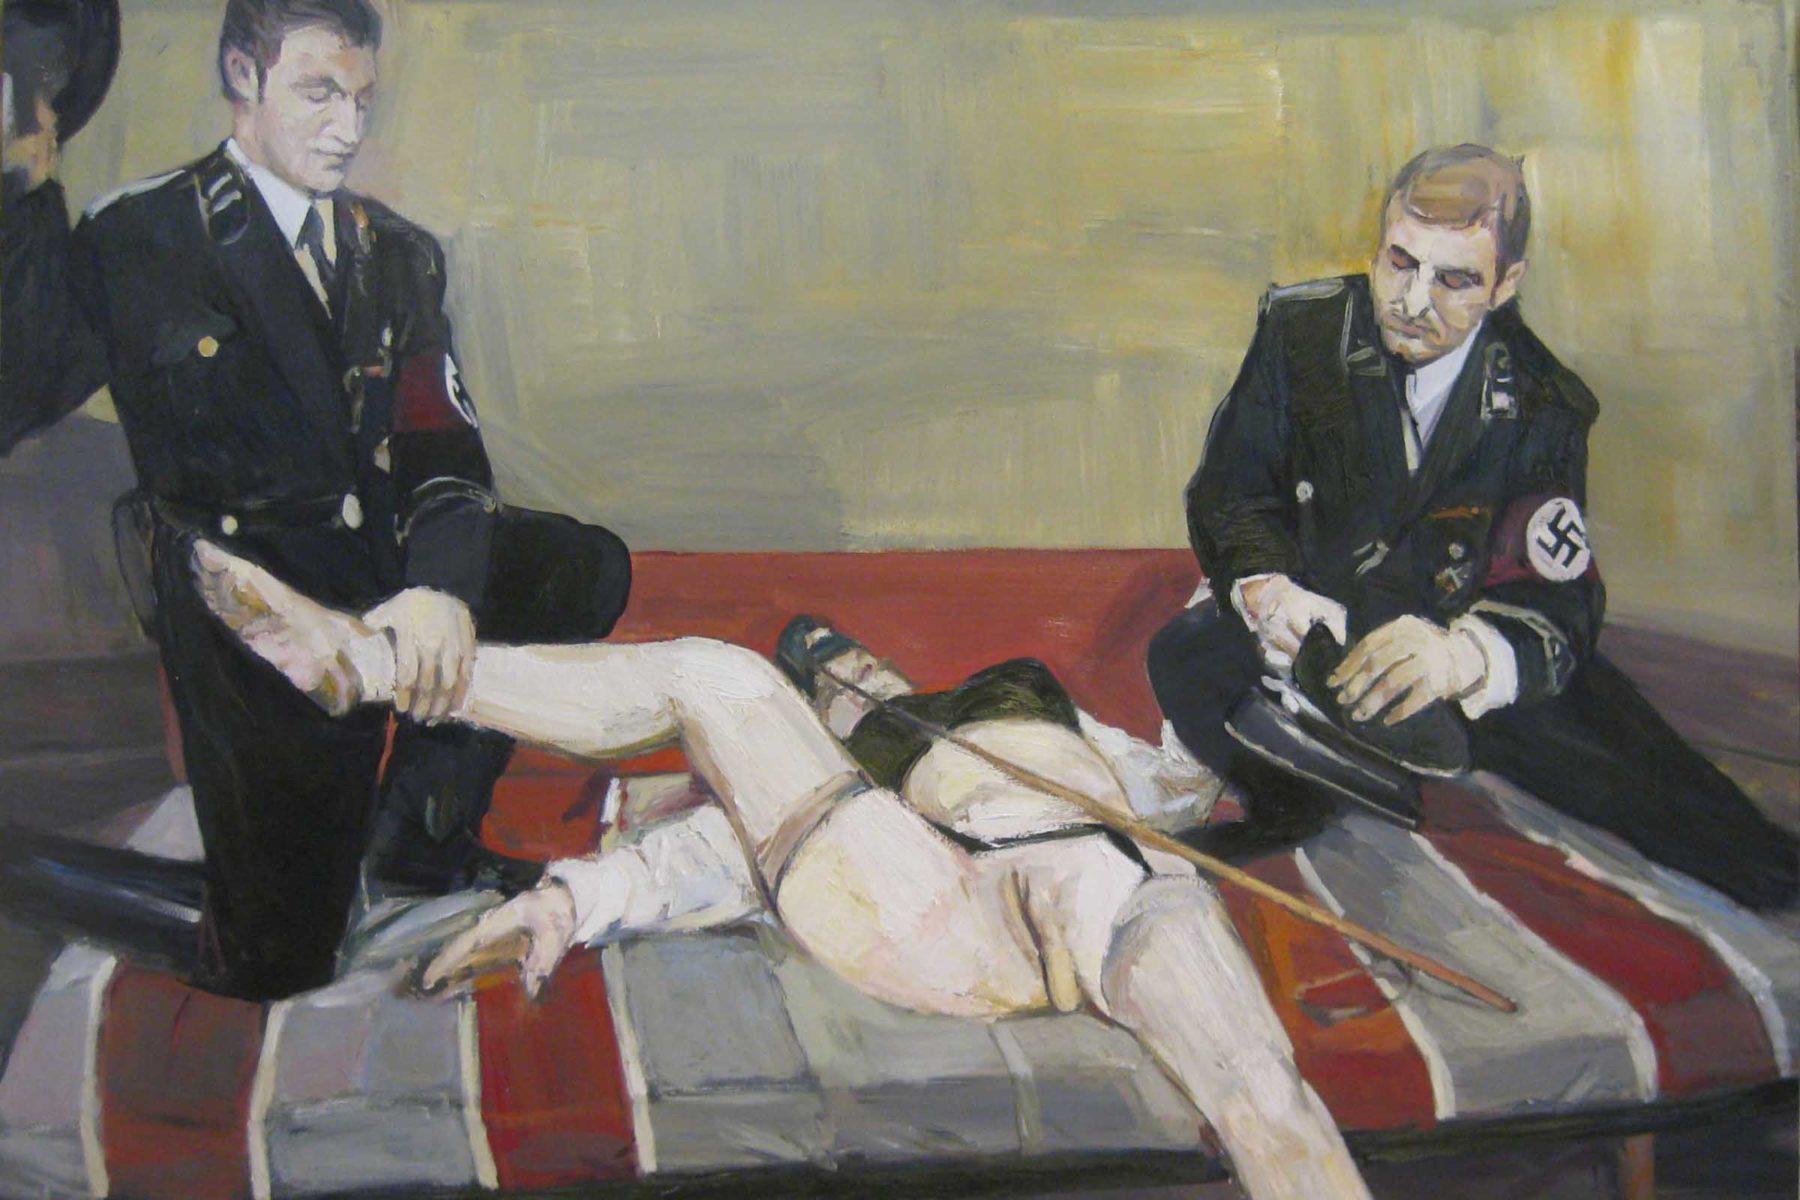 Aleksander Veliscek, Brownie Queen, 2011, oil on canvas, 200 x 160 cm